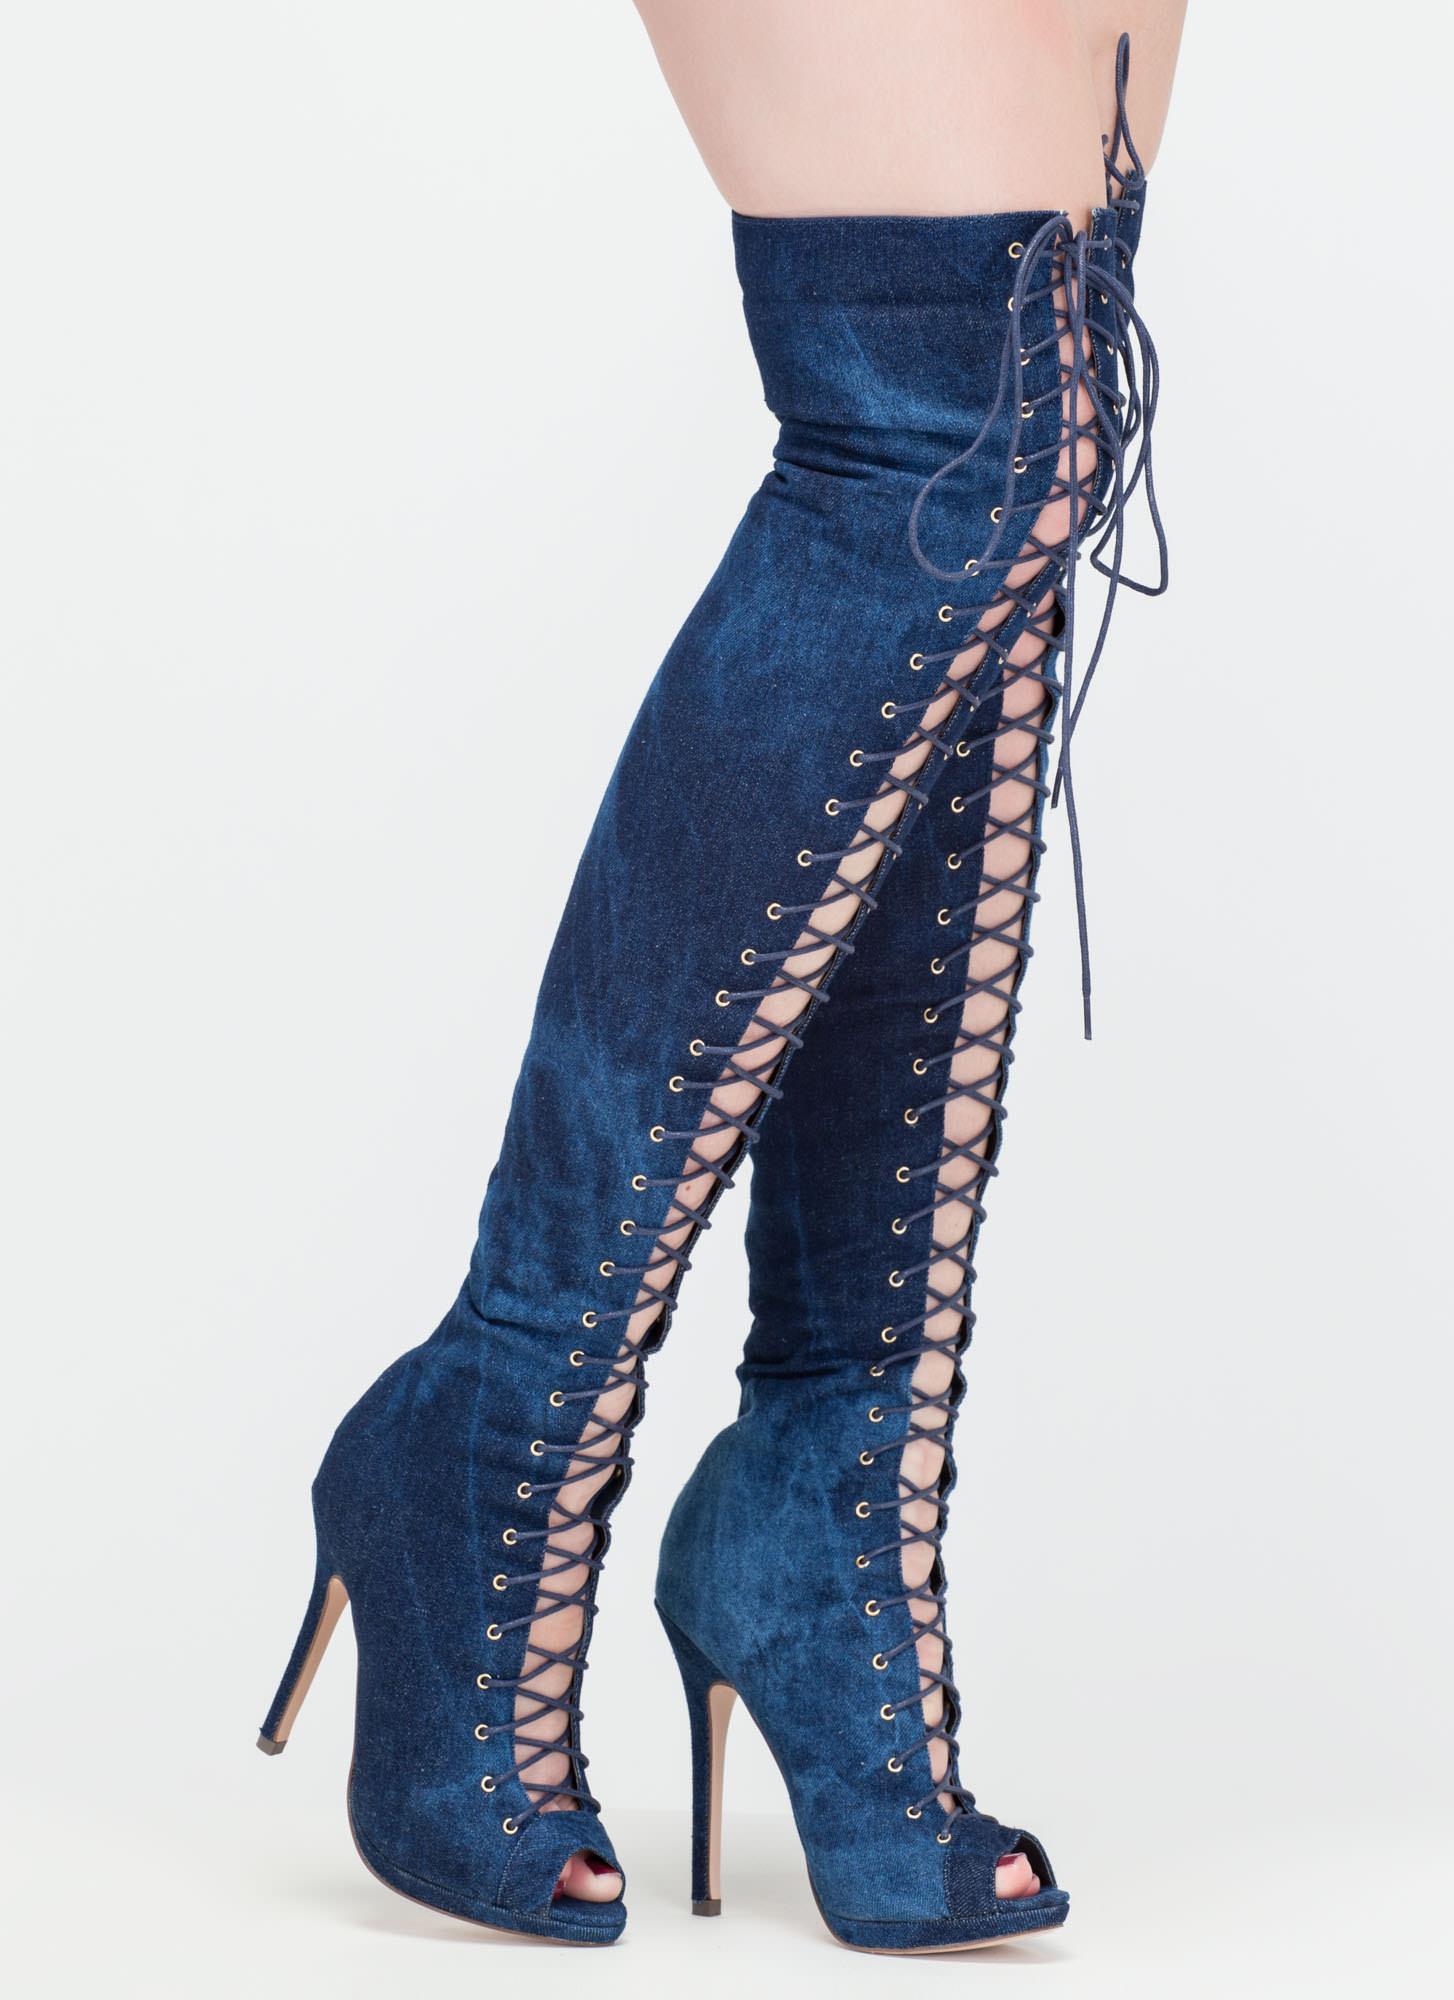 Denim Over-The-Knee Boots GREY BLACK DENIM - GoJane.com